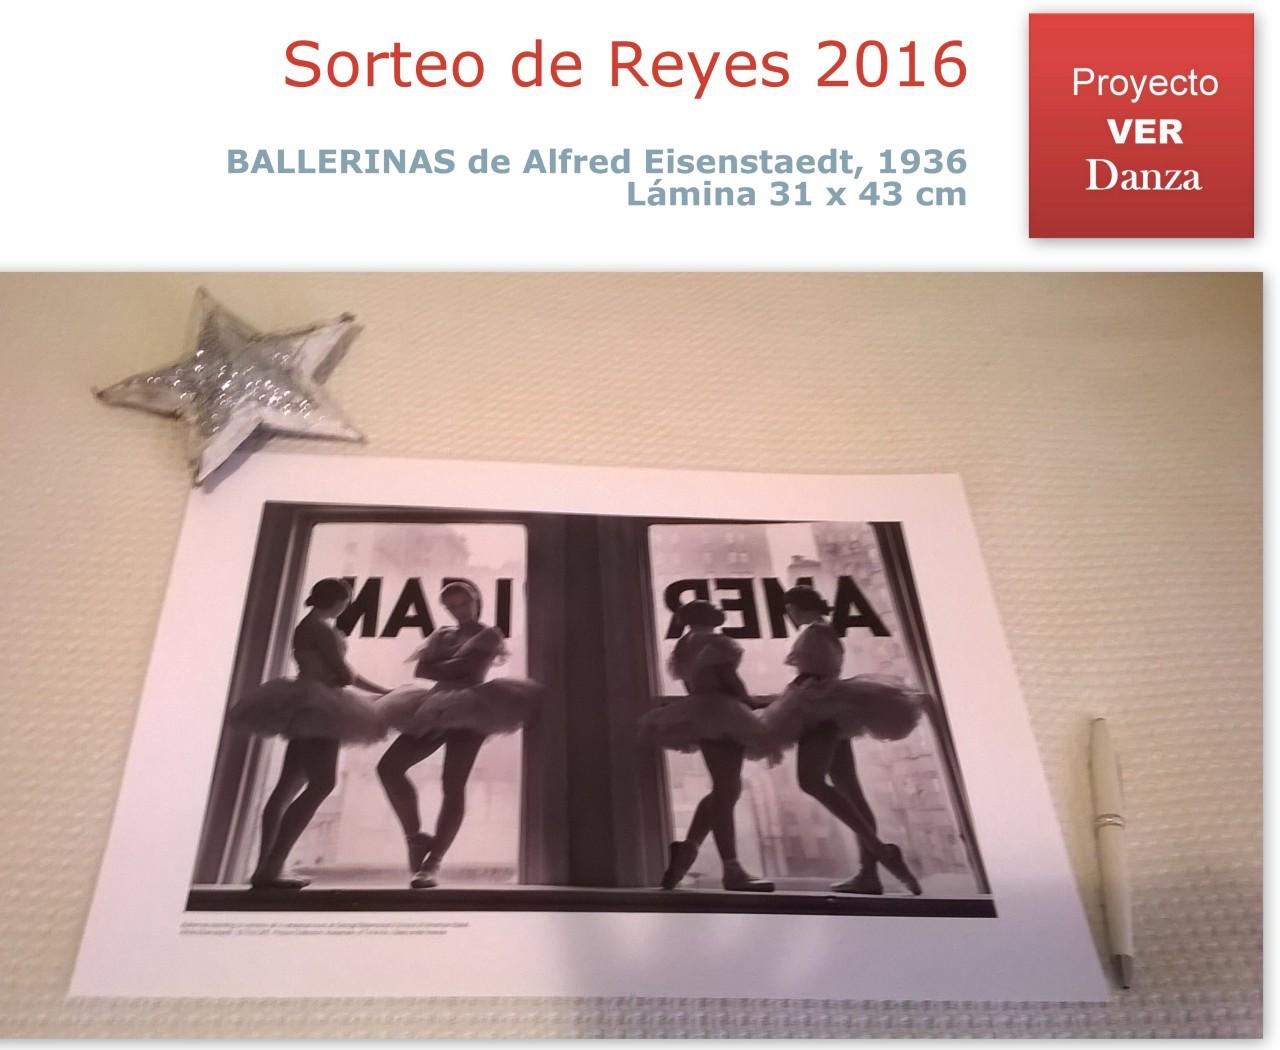 Sorteo REYES 2016 Proyecto VER Danza